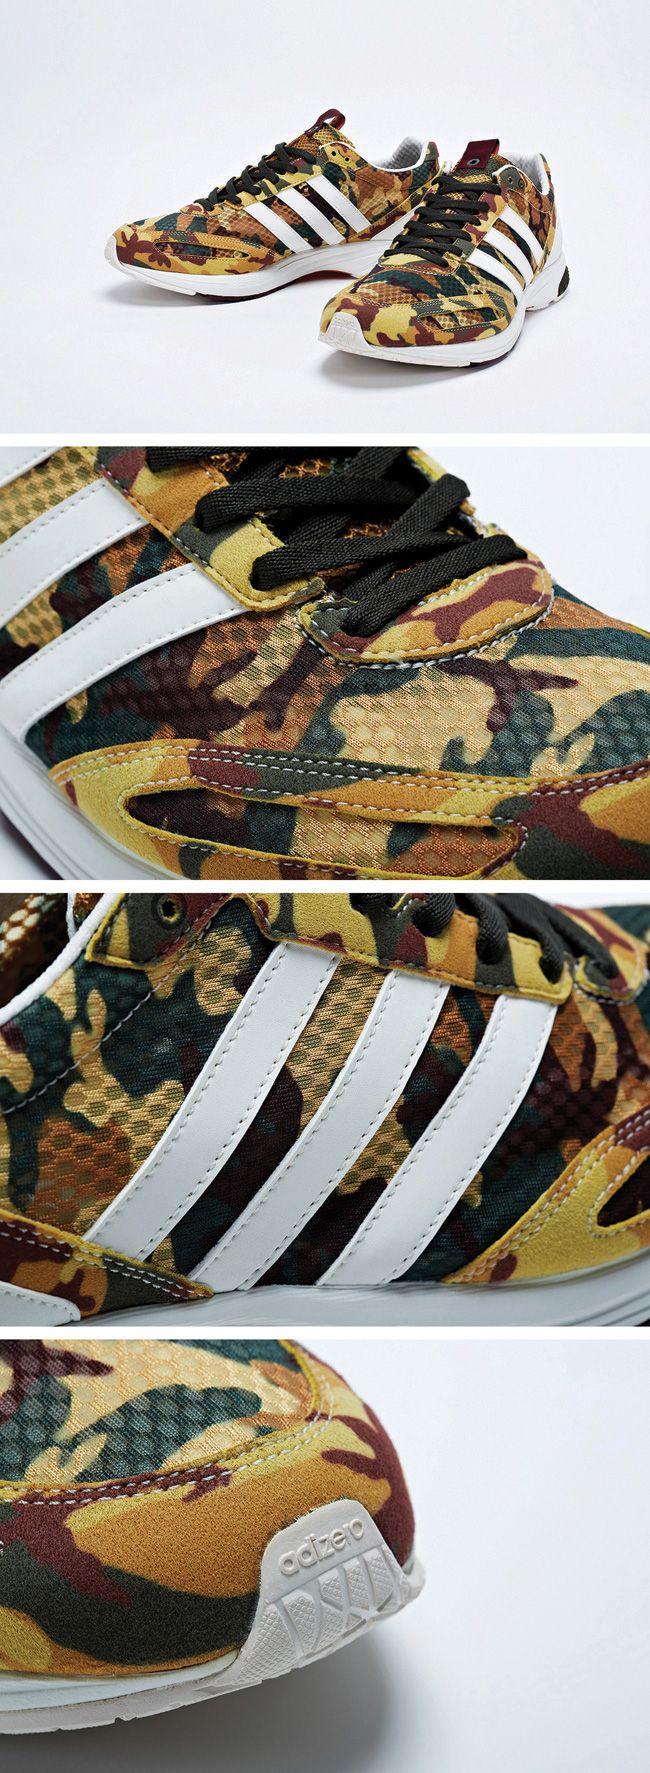 #adidas Adizero #Camo #Sneakers